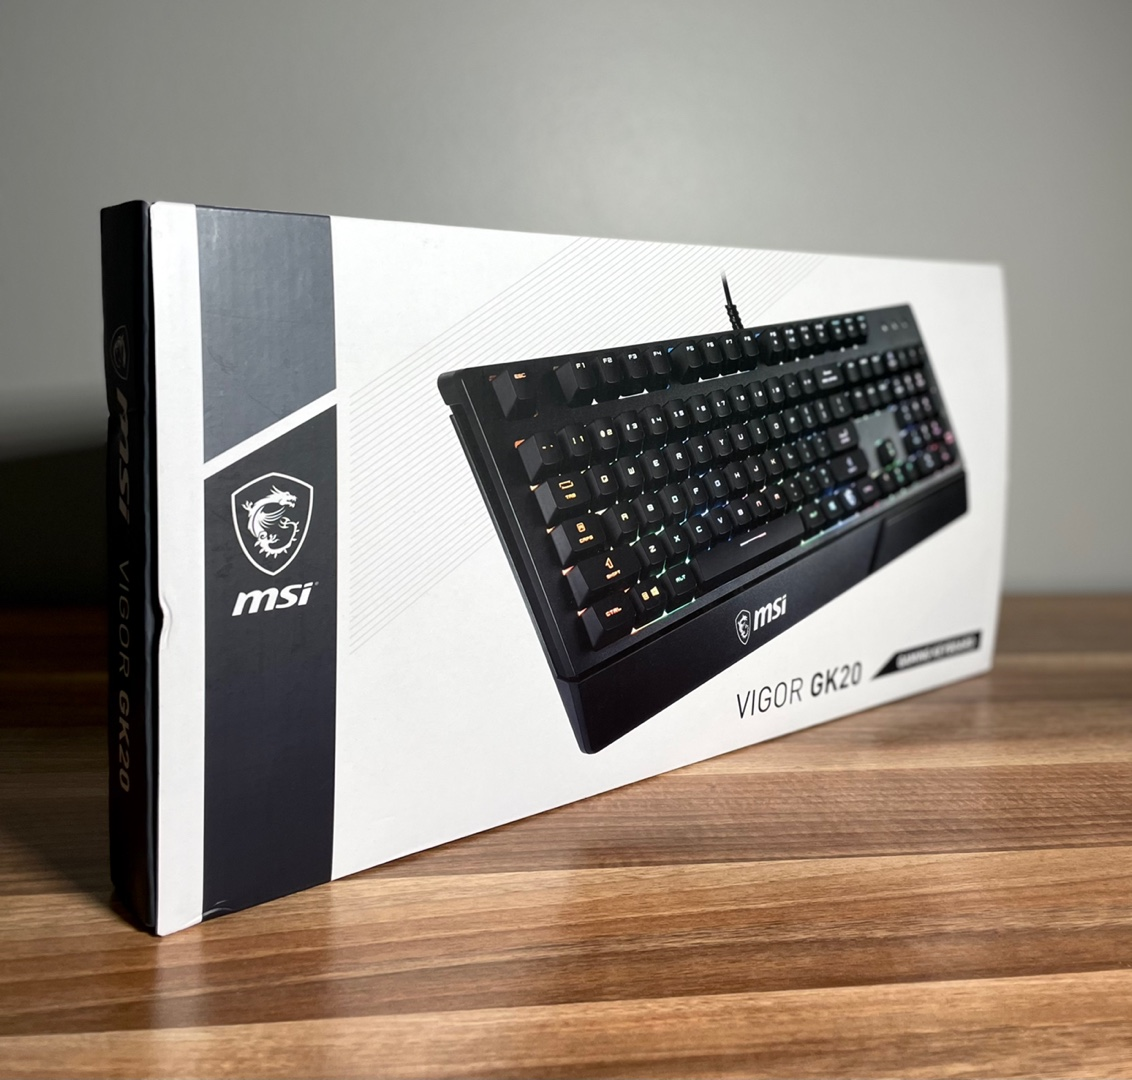 MSİ Vigor GK20 RGB Klavye (Garantili)